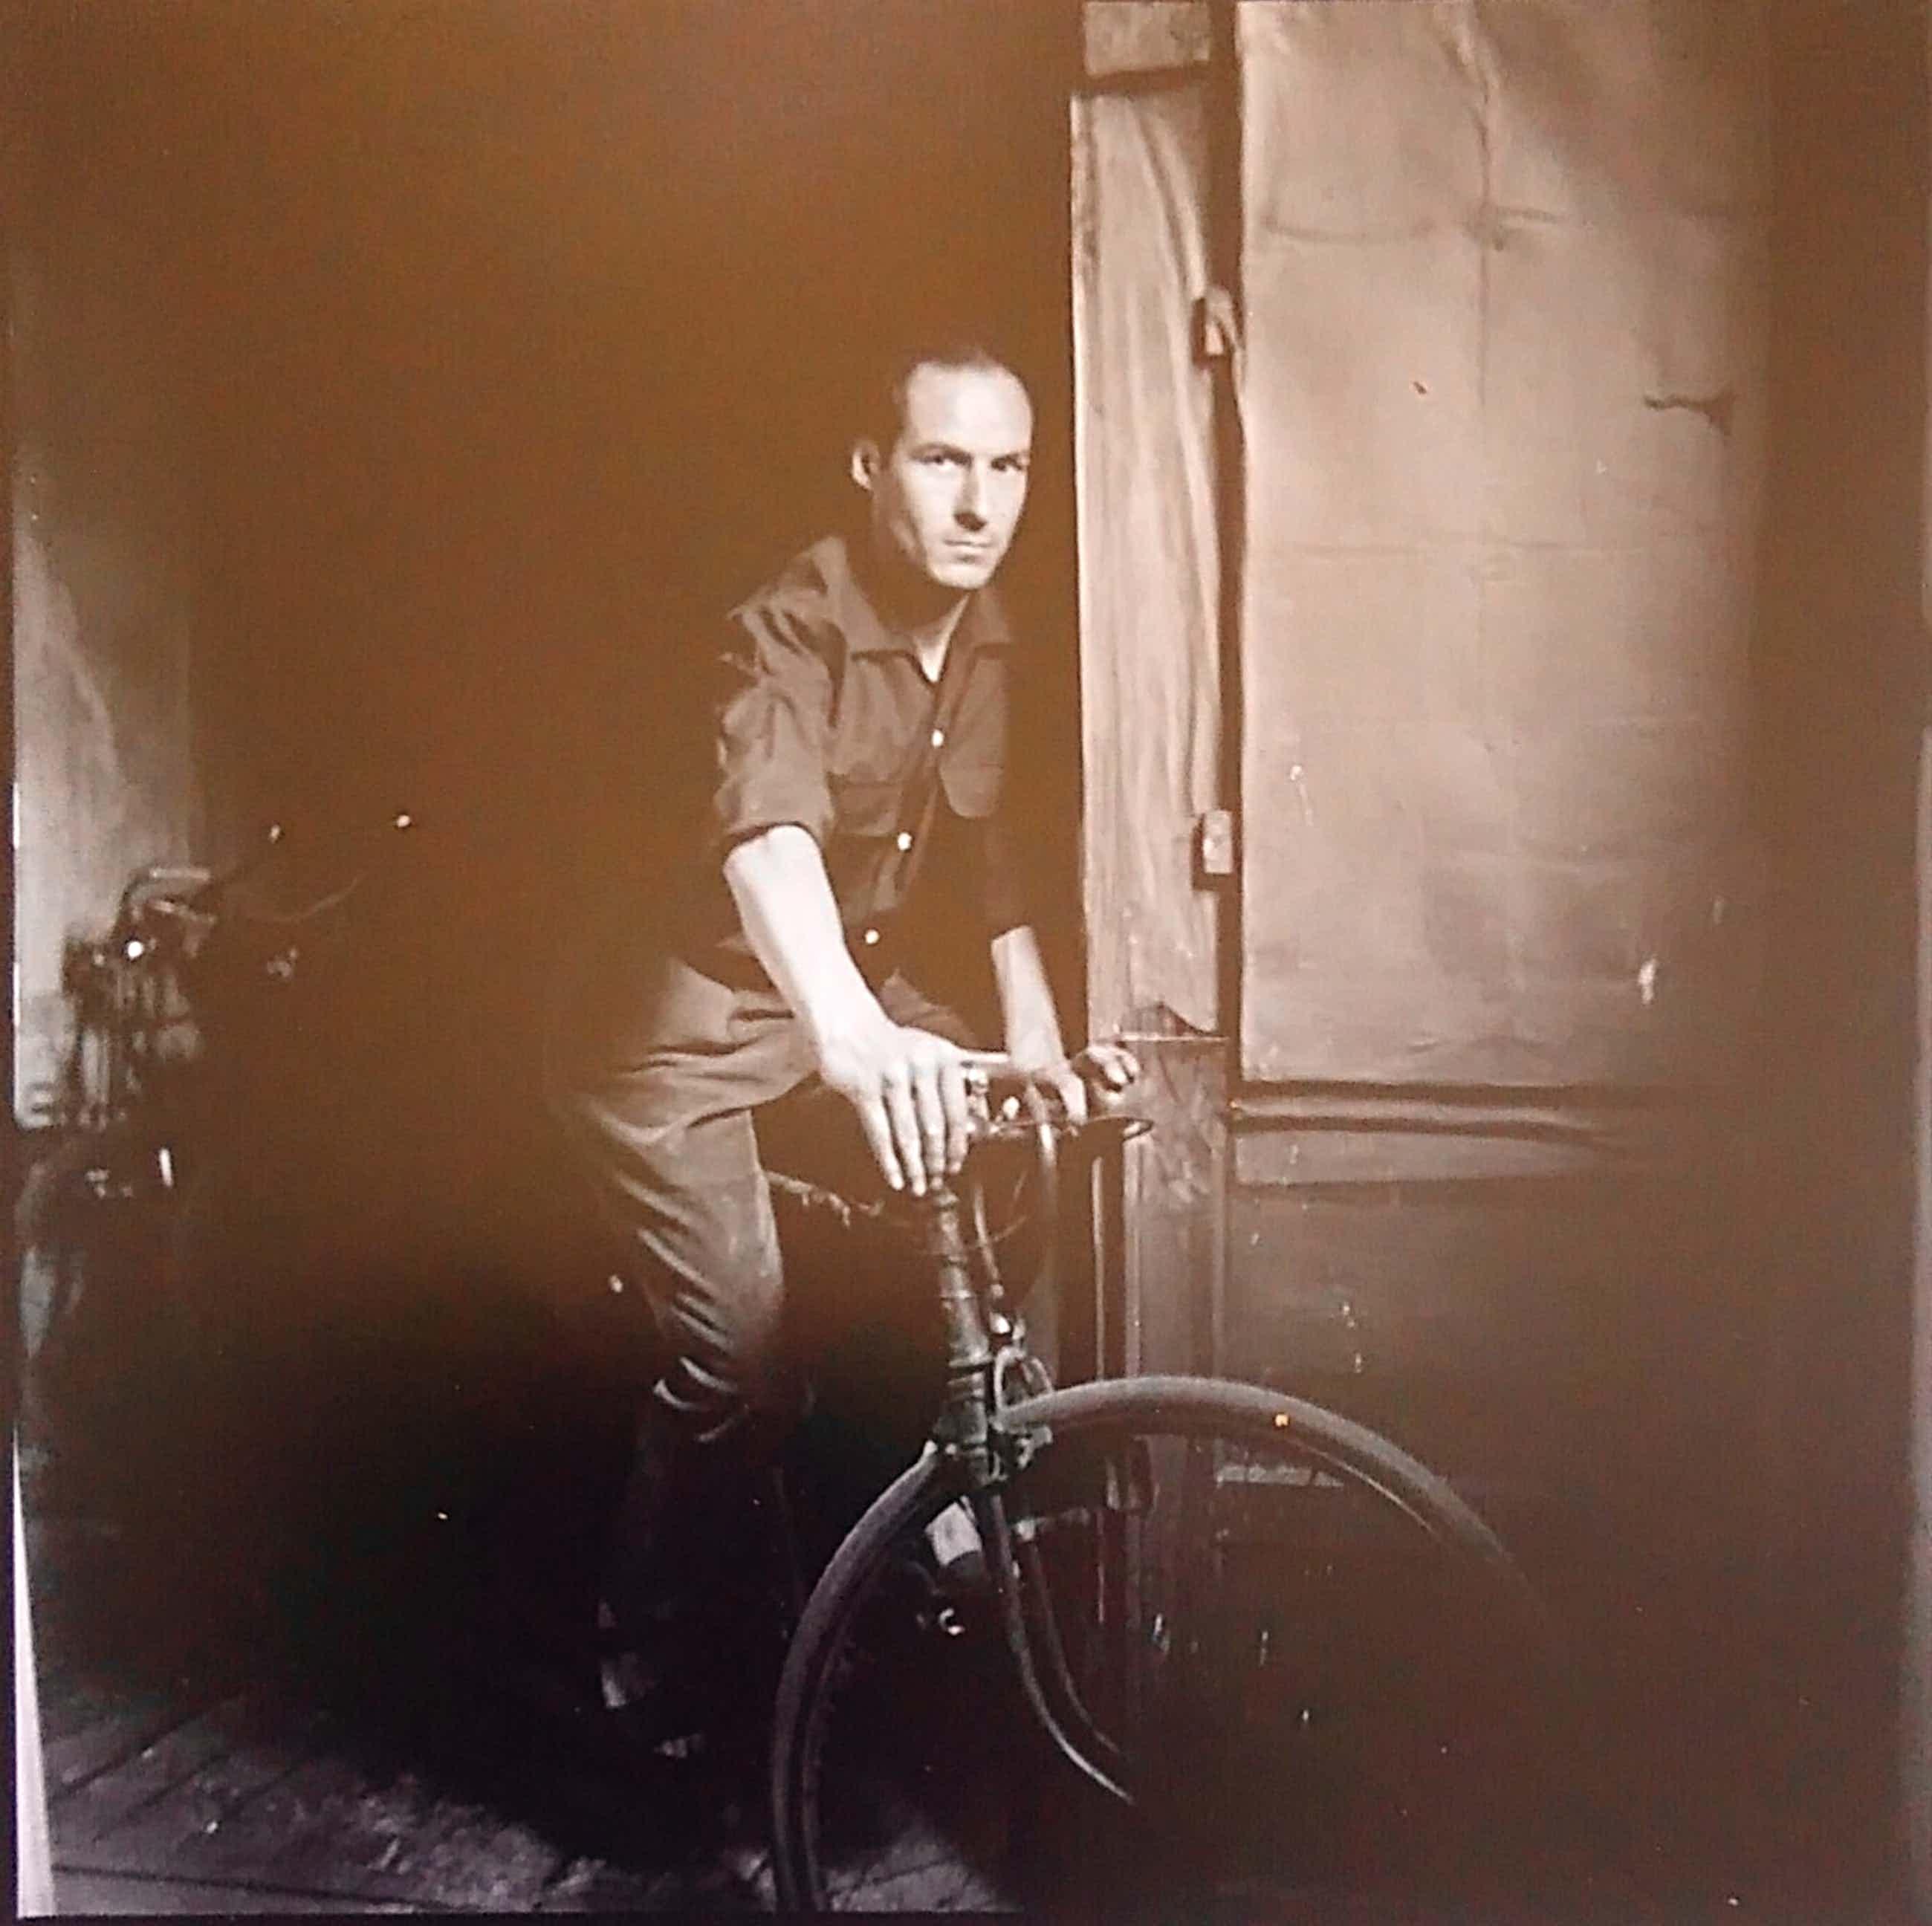 Henny Riemens - Portretfoto Corneille 1951-54 kopen? Bied vanaf 50!